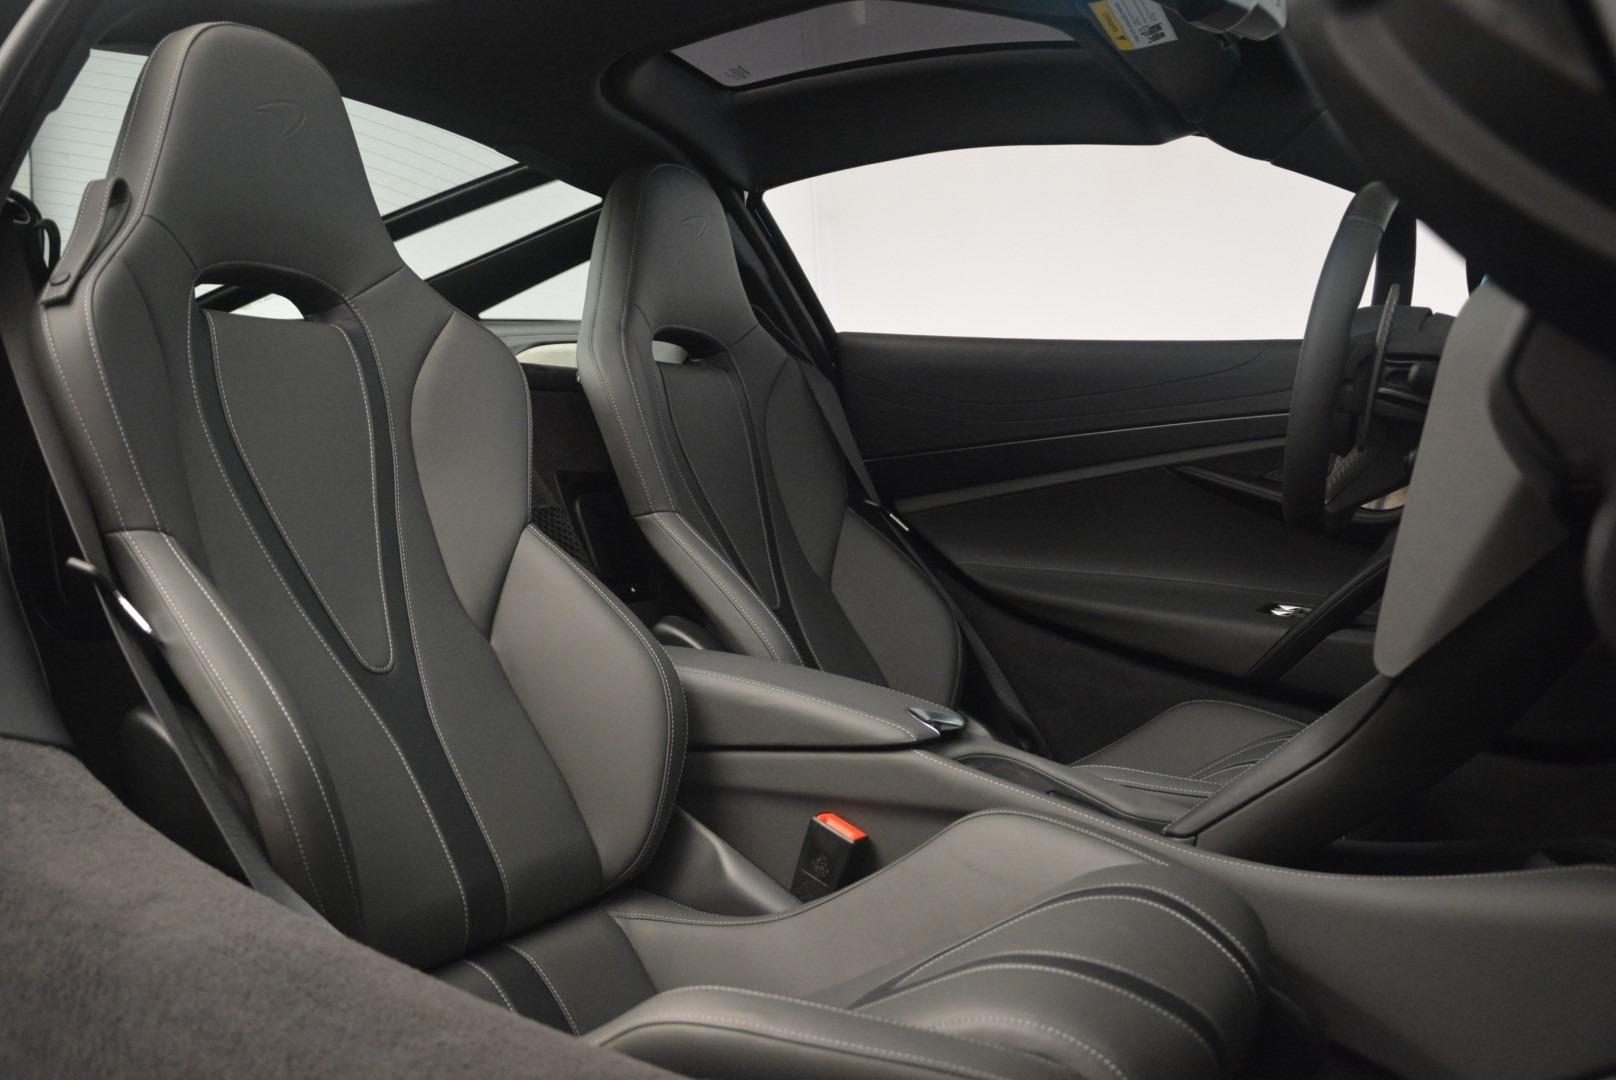 Used 2018 McLaren 720S Coupe For Sale In Westport, CT 2449_p21